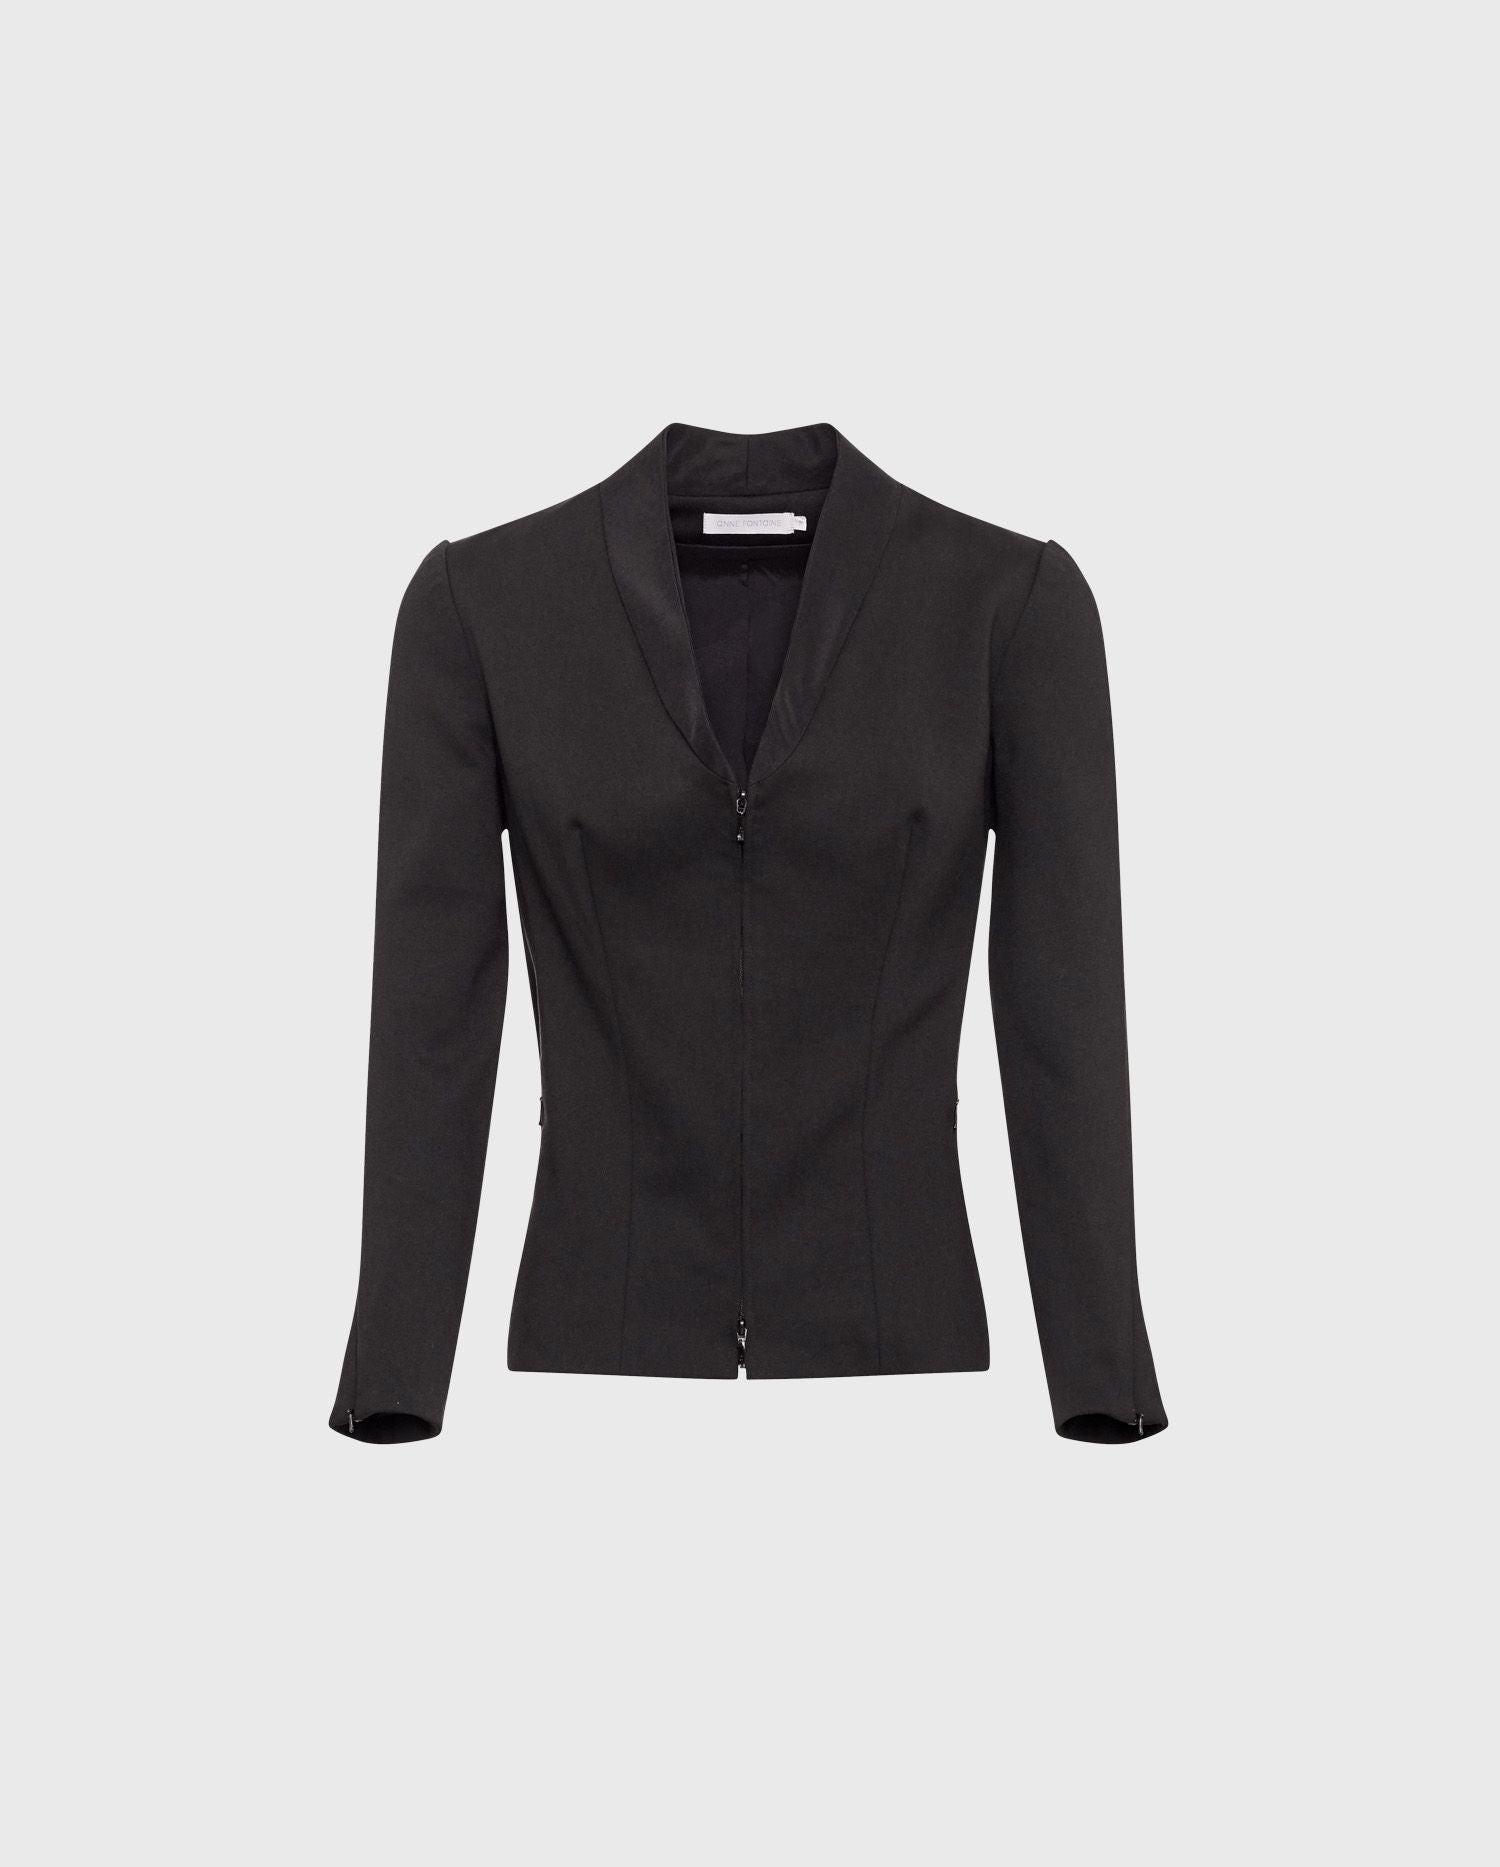 Anne Fontaine LIAM Jacket: Black mock shawl collar jacket